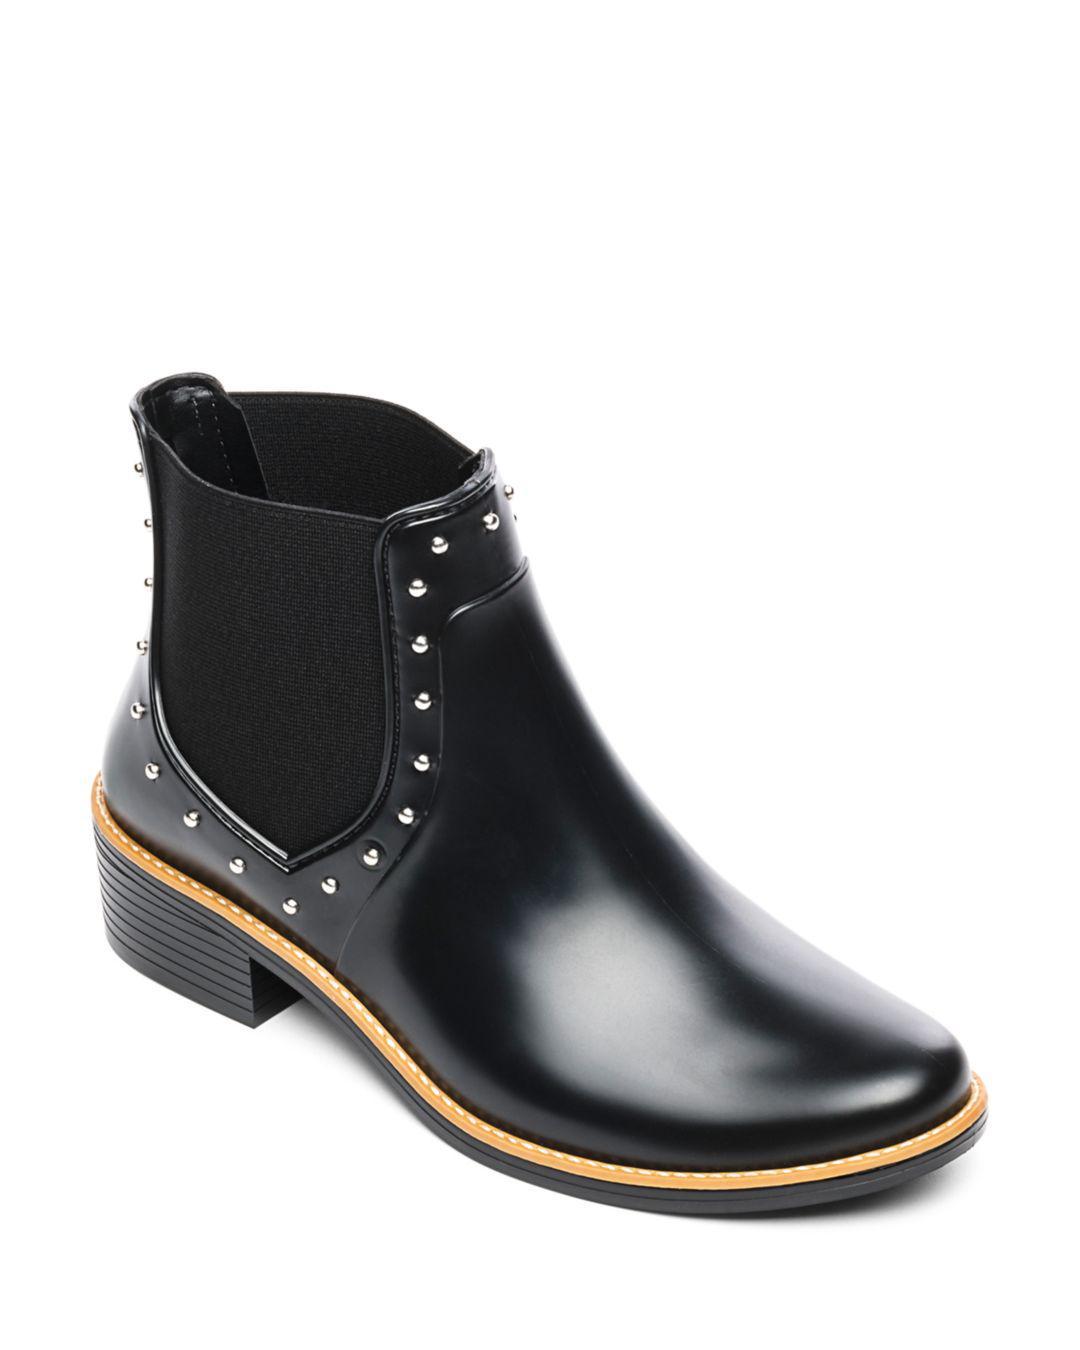 c6f25d6203f5fe Bernardo - Black Peyton Studded Rubber Rain Ankle Boots - Lyst. View  fullscreen